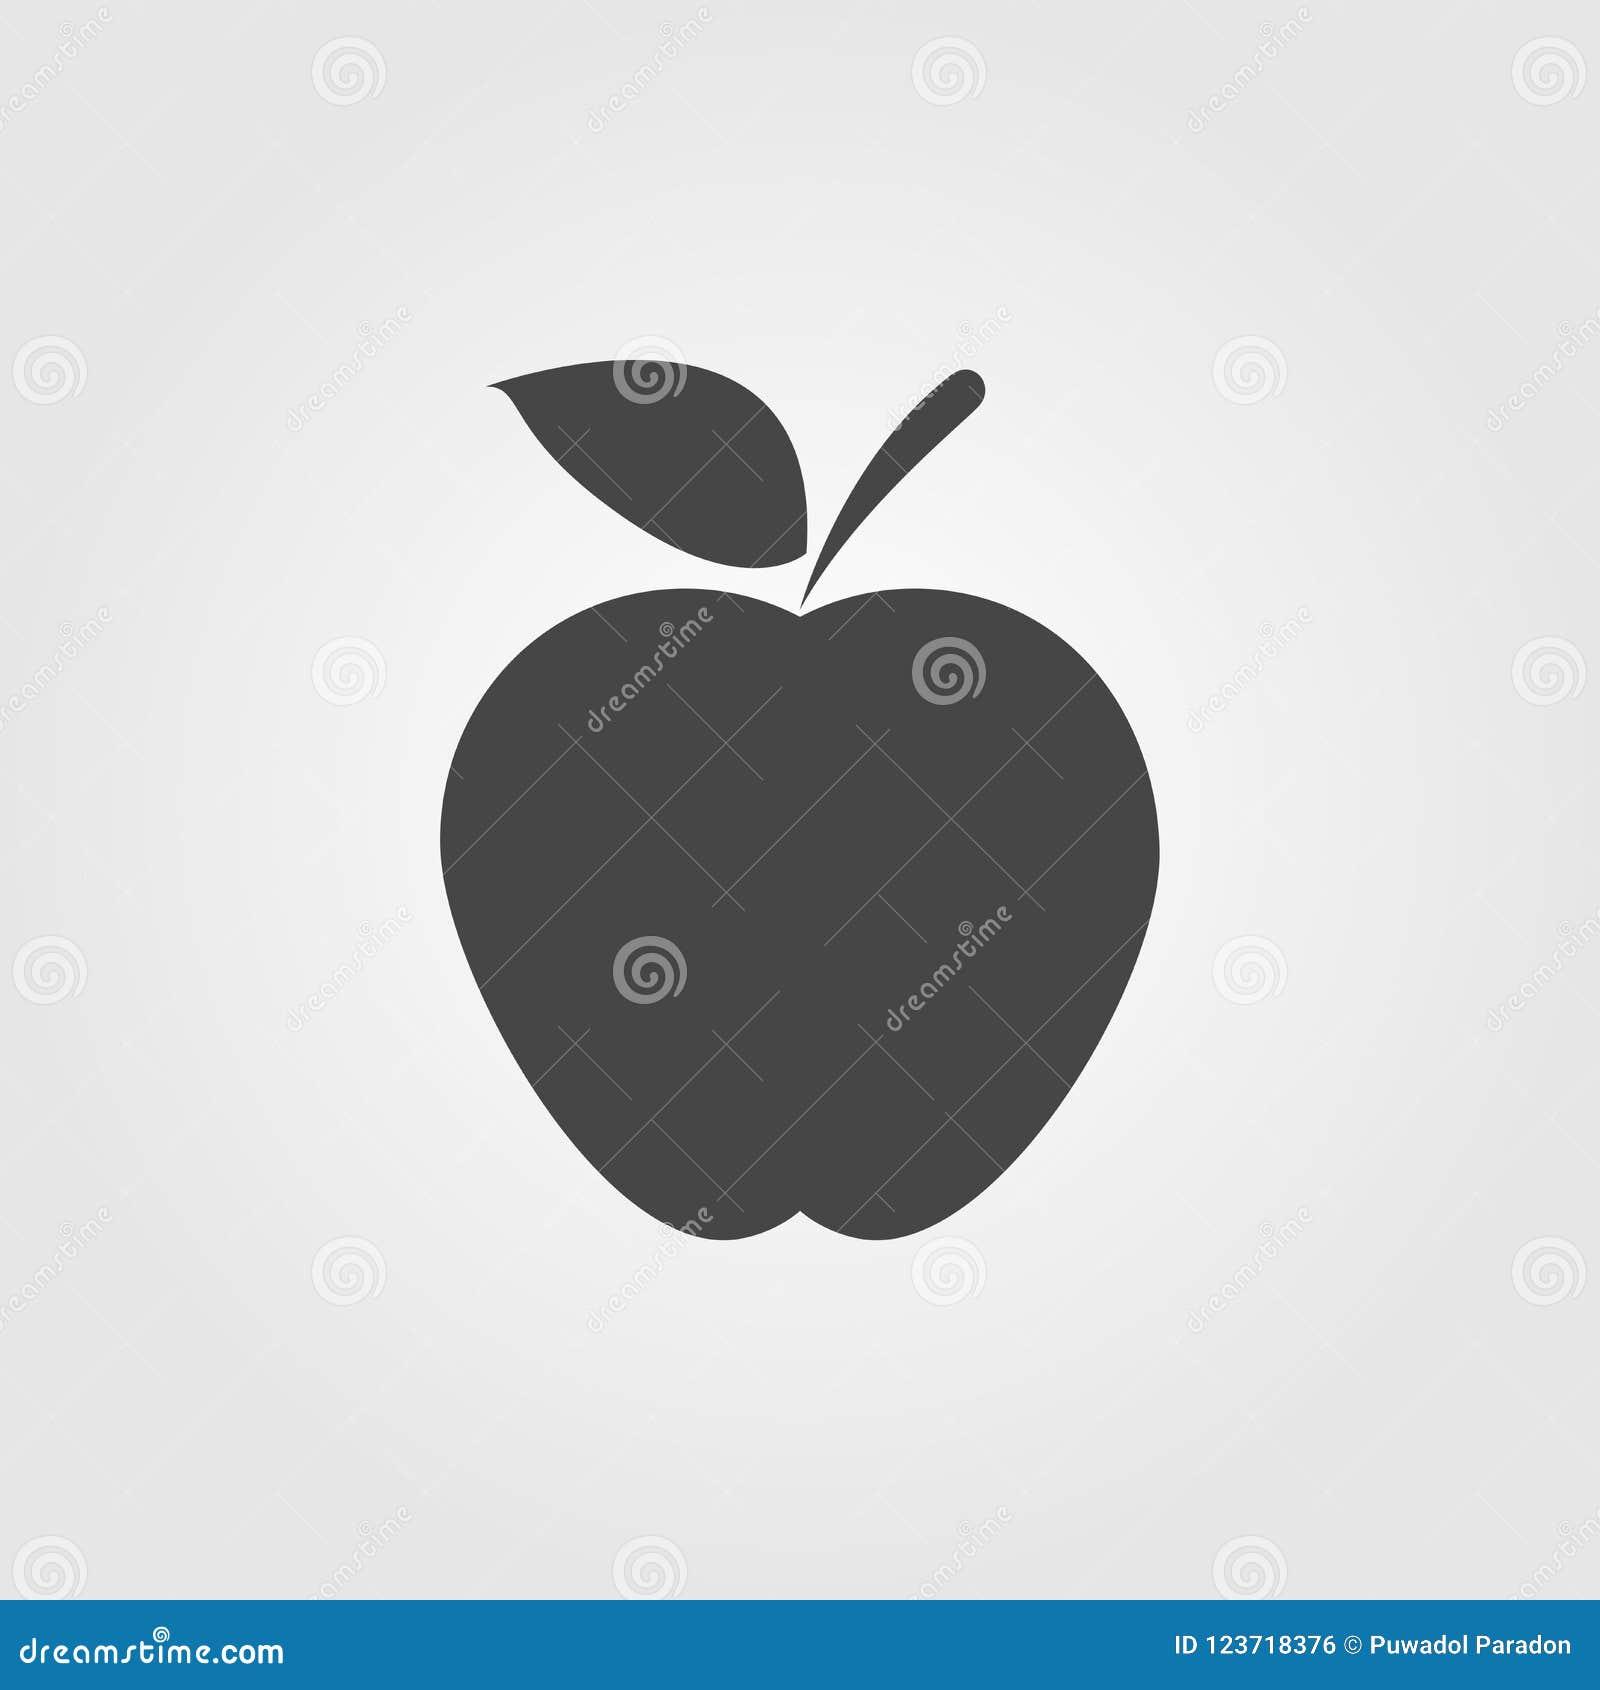 apple icon flat style isolated on background. apple sign symbol